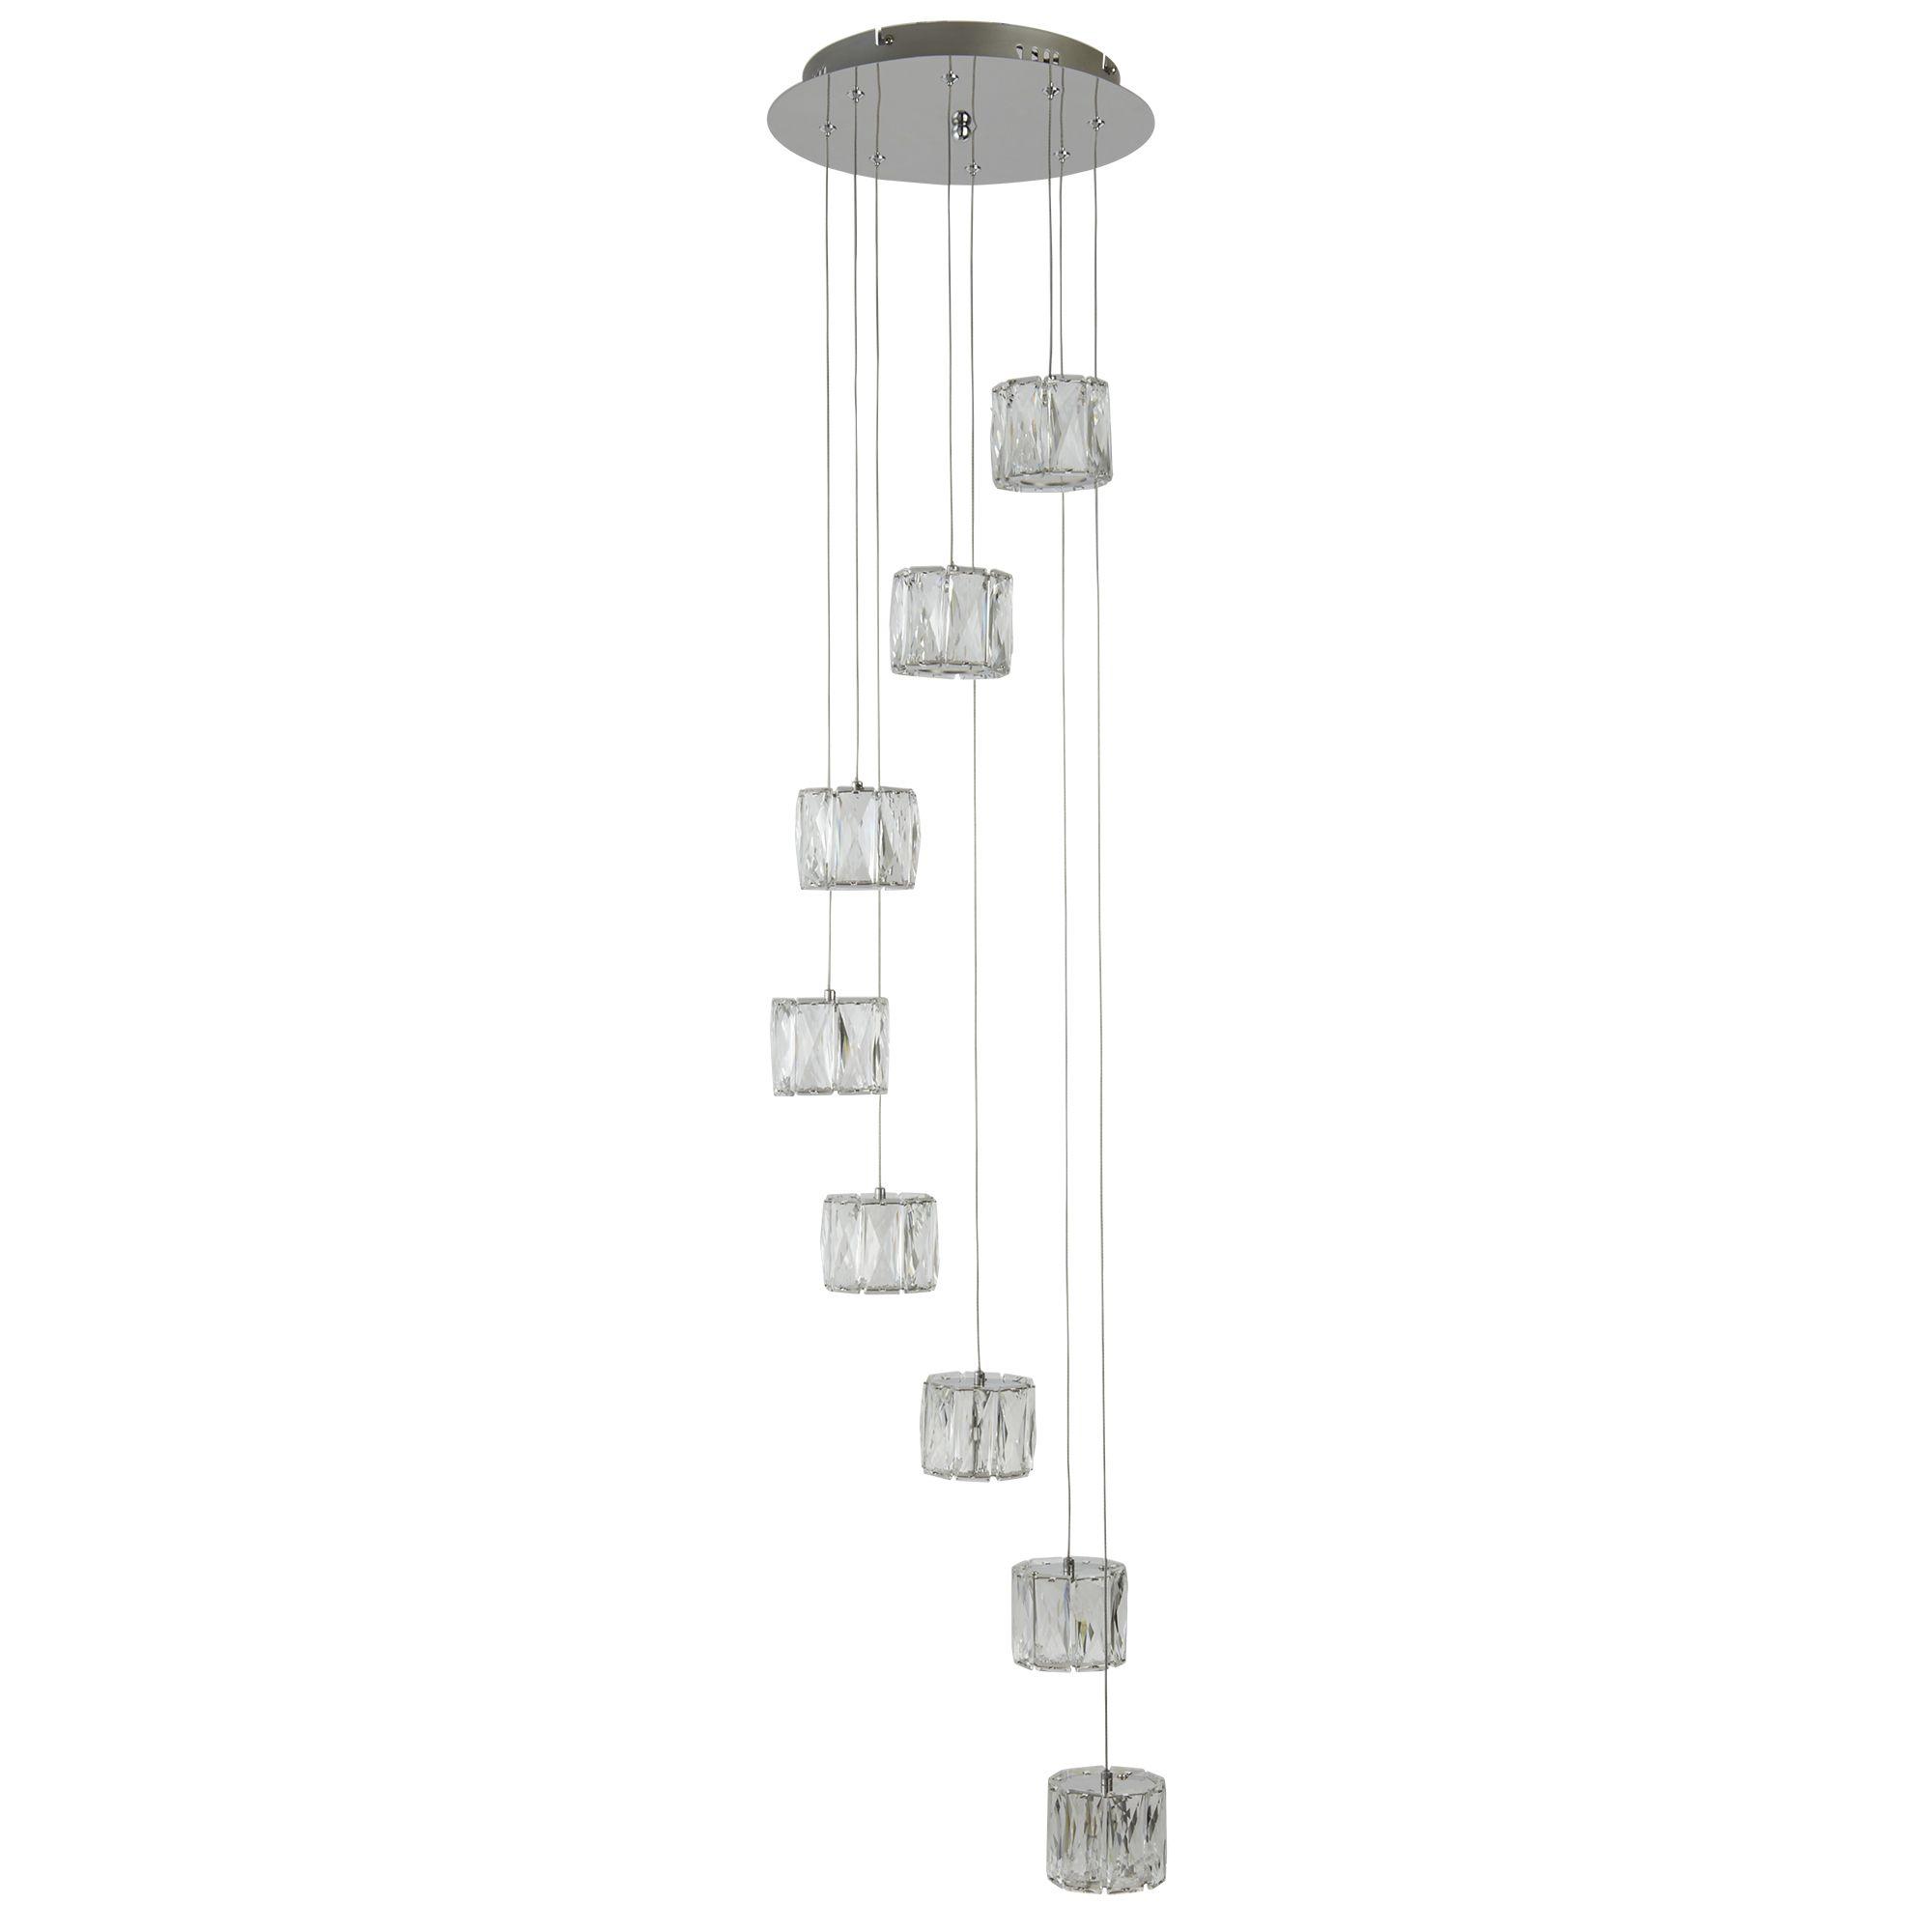 Led 8 Light Octagon Ceiling Multi Drop Clear Crystal Trim